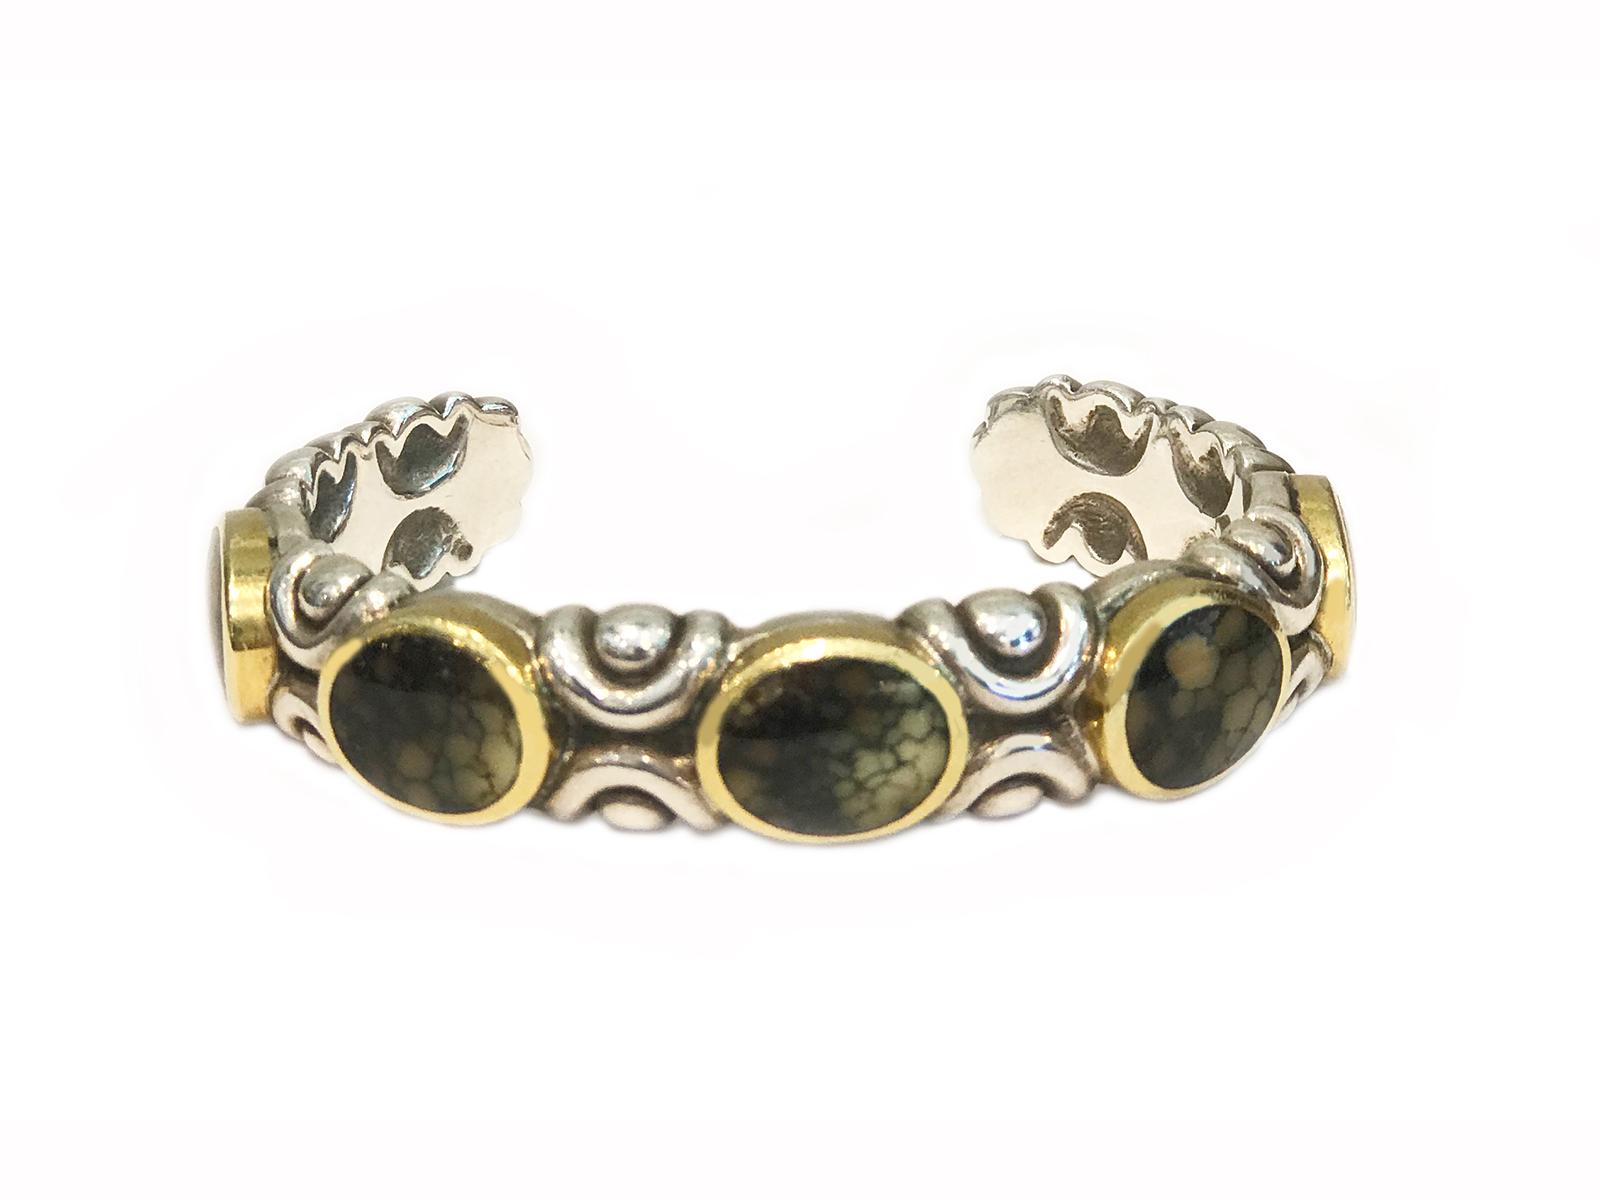 Damele Turquoise 5 Stone Cuff